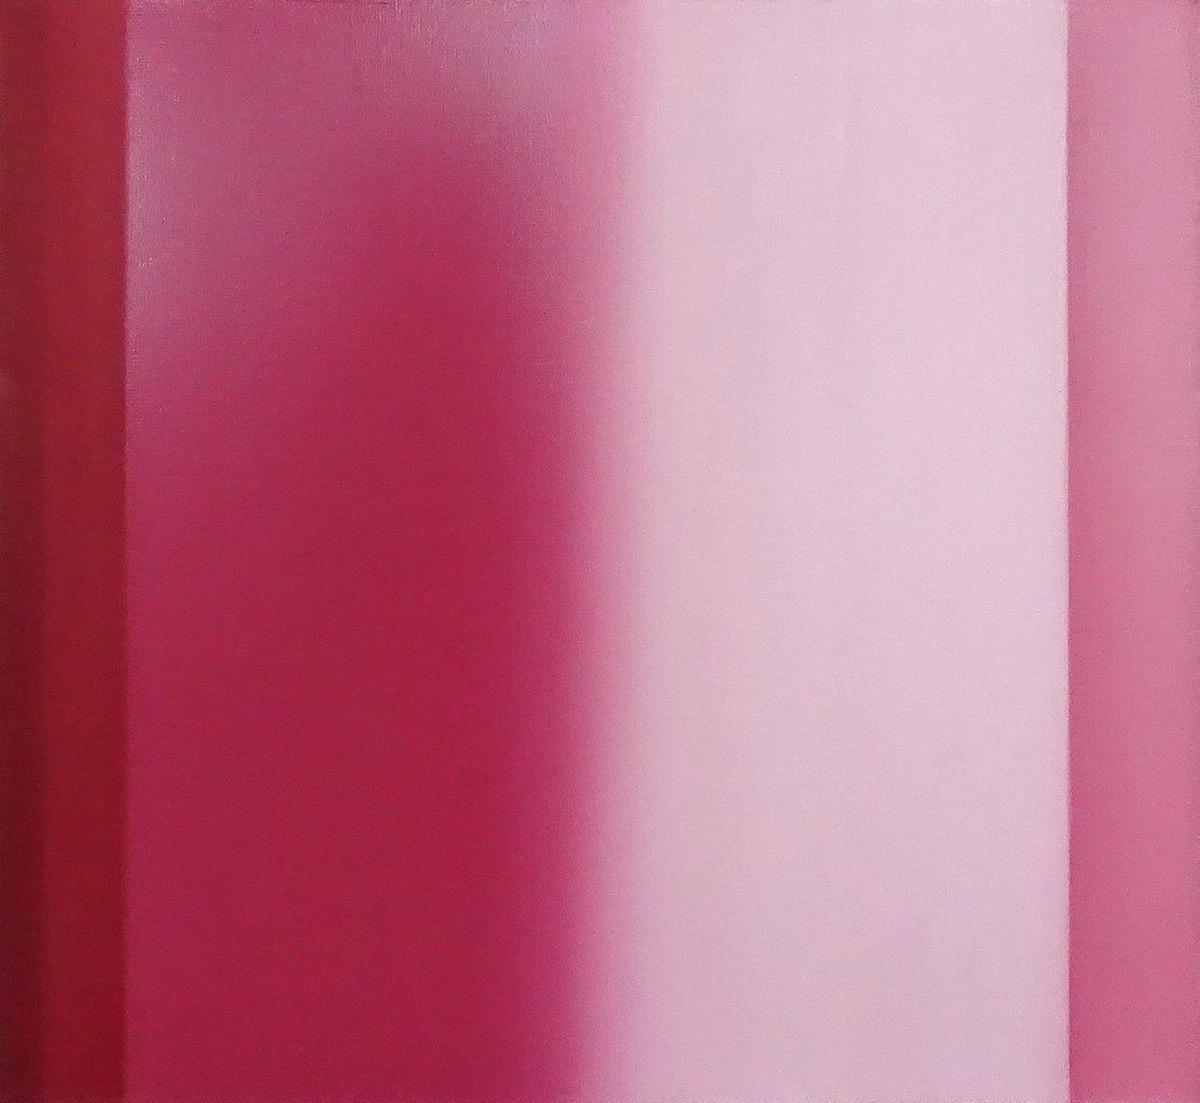 Anna Podlewska - Passage in purple